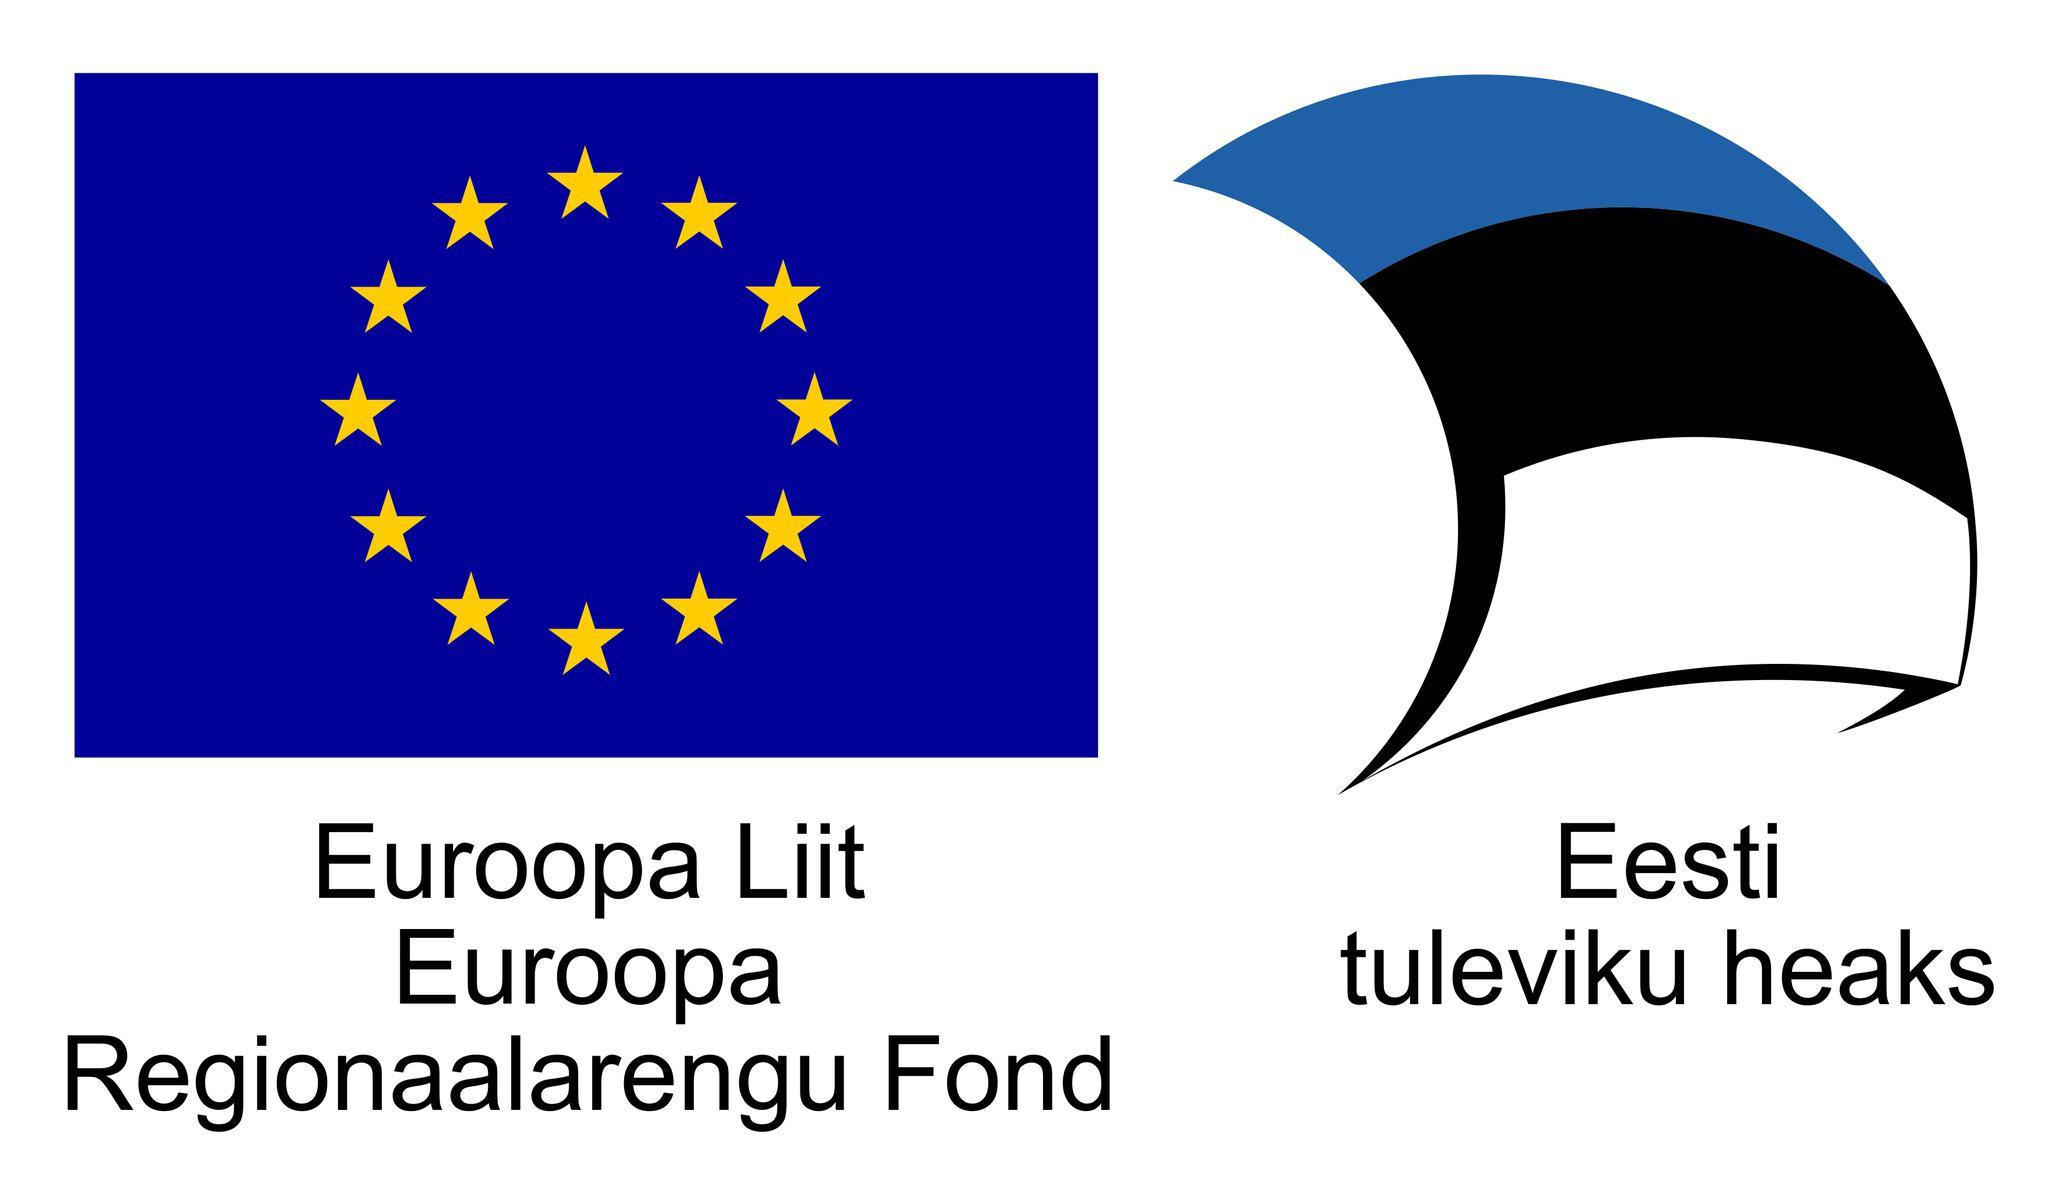 EL Regionaalarengufond